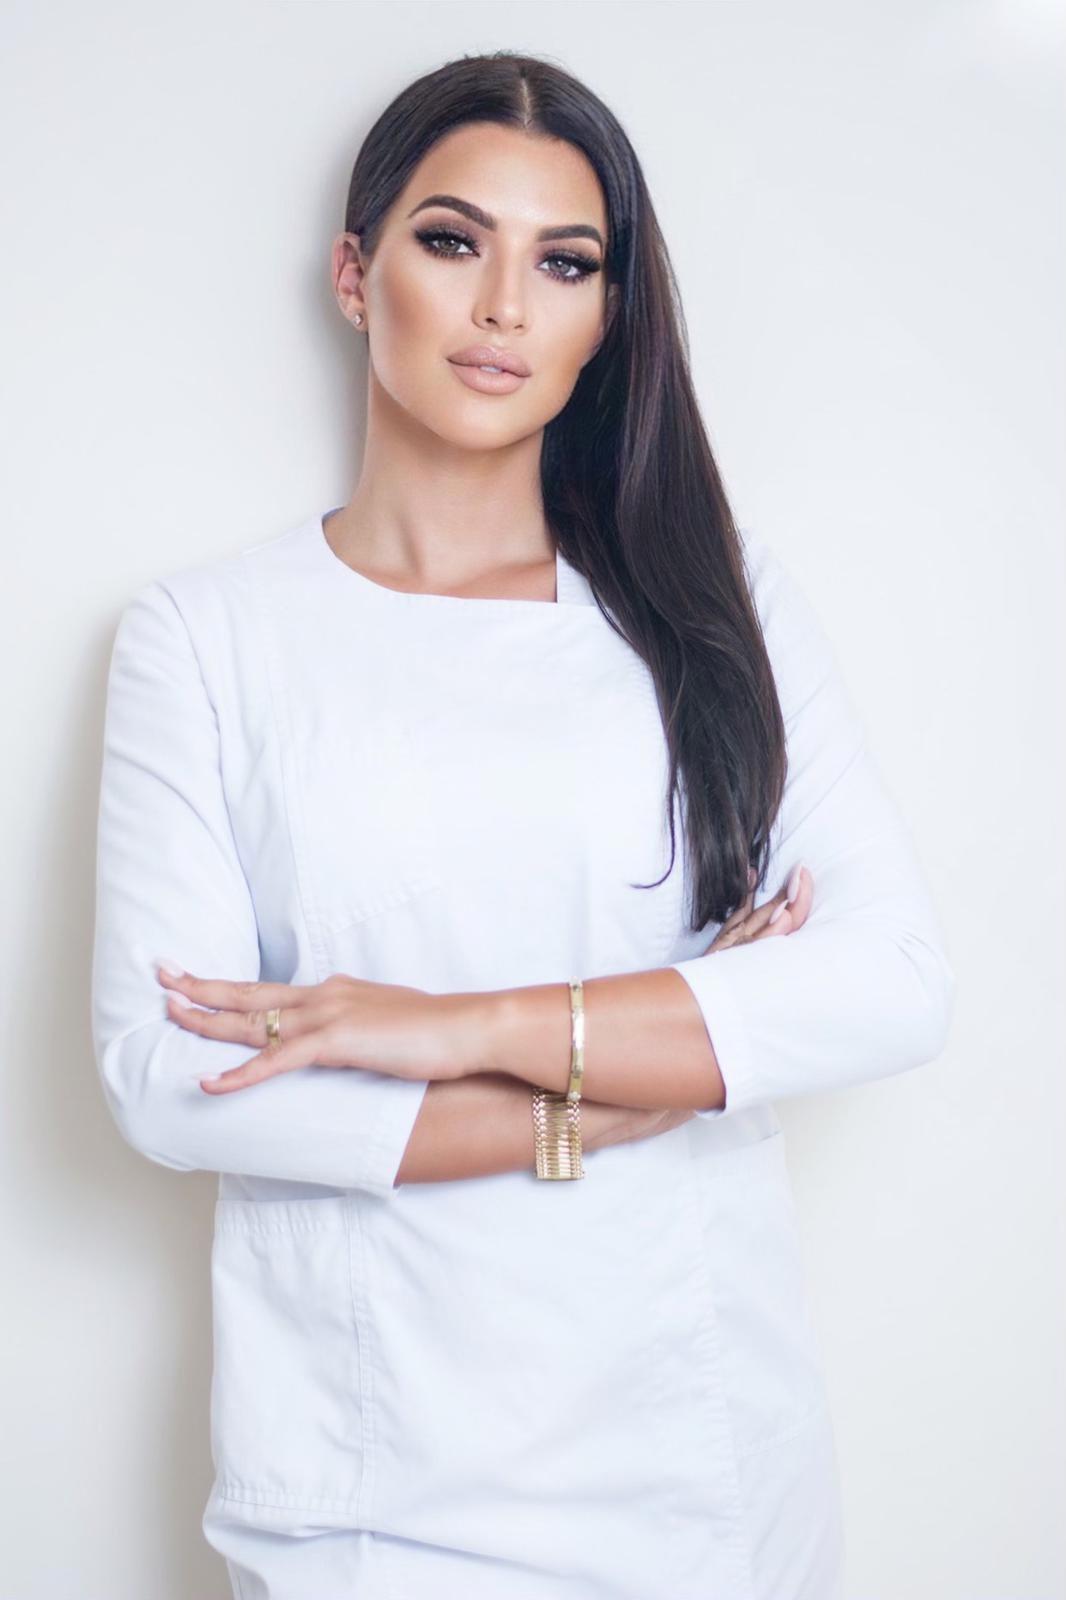 Paula Waligóra - Kosmetolog w MEDICOR